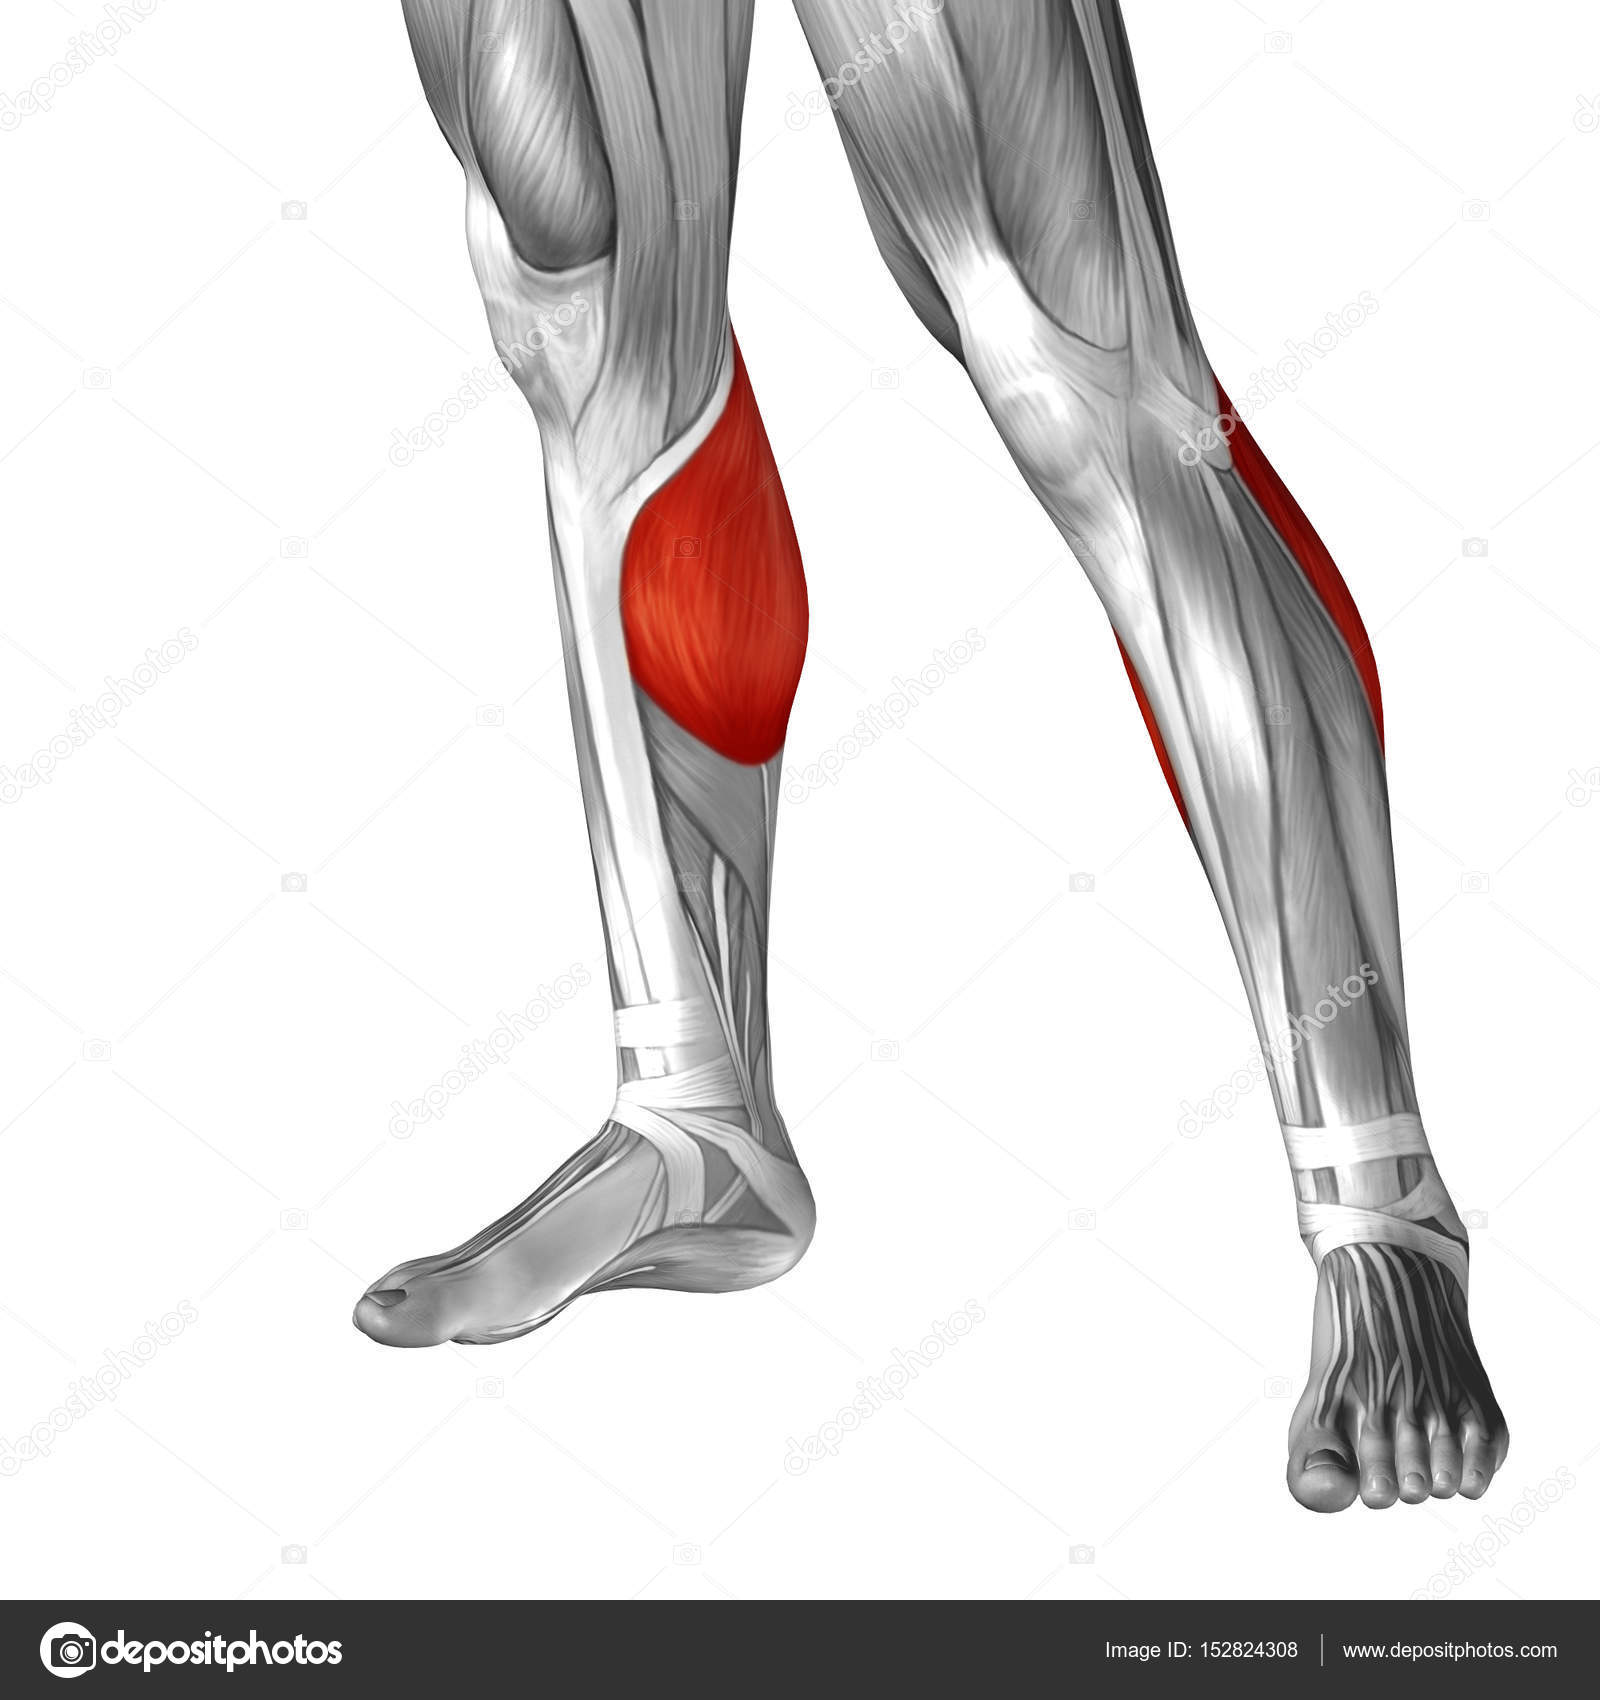 human lower legs anatomy — Stock Photo © design36 #152824308